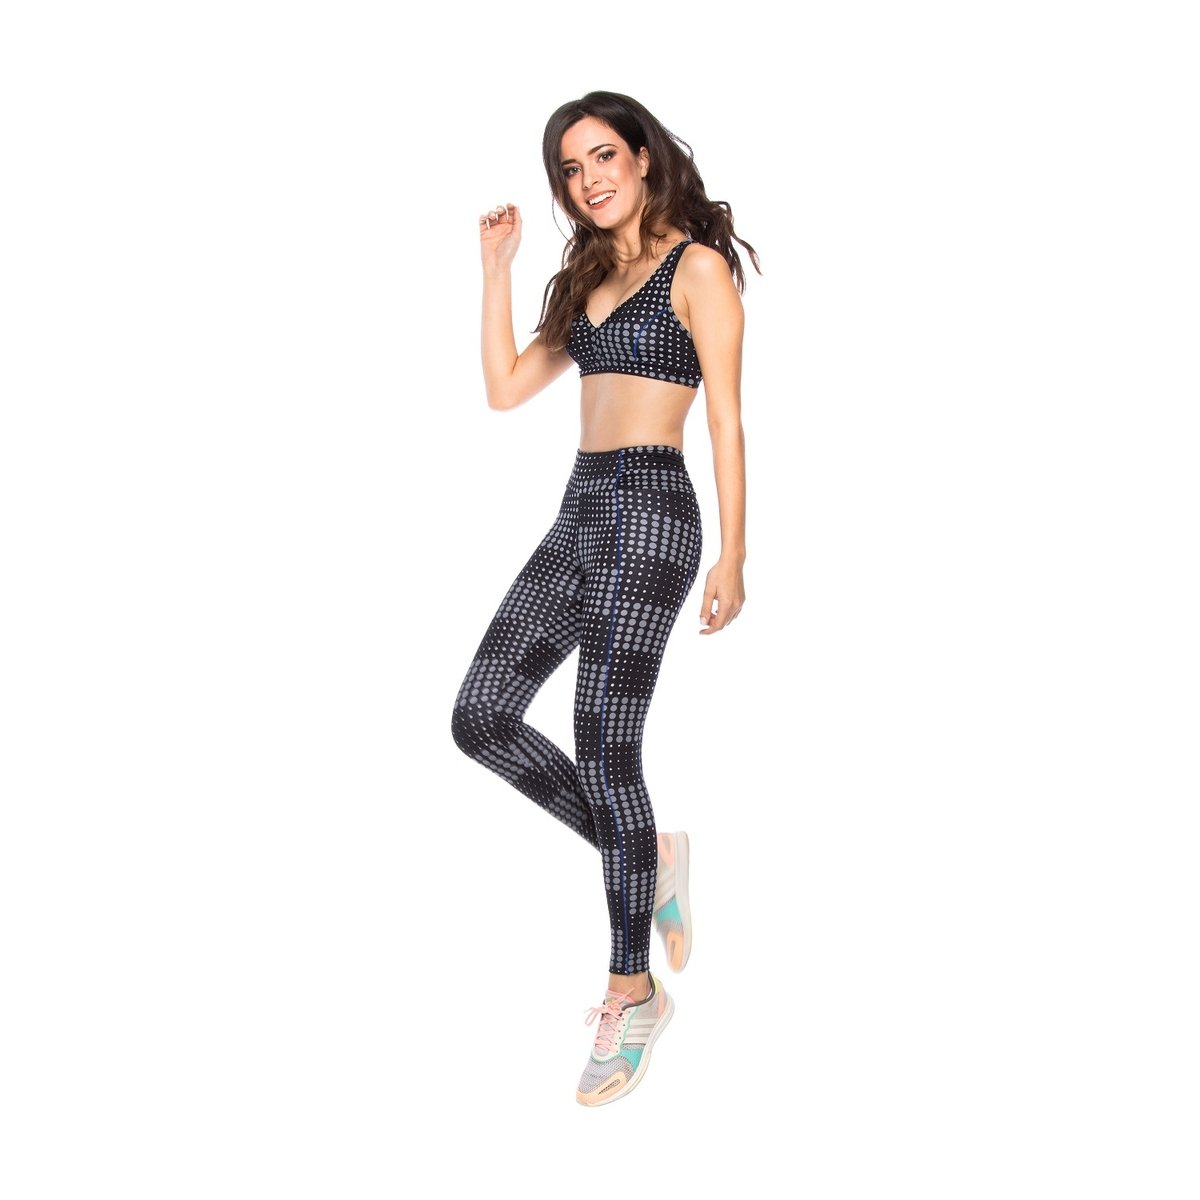 Cós Cós Franzido Franzido Fitness Legging Fit Fitness Preto Legging n1Xdzzx